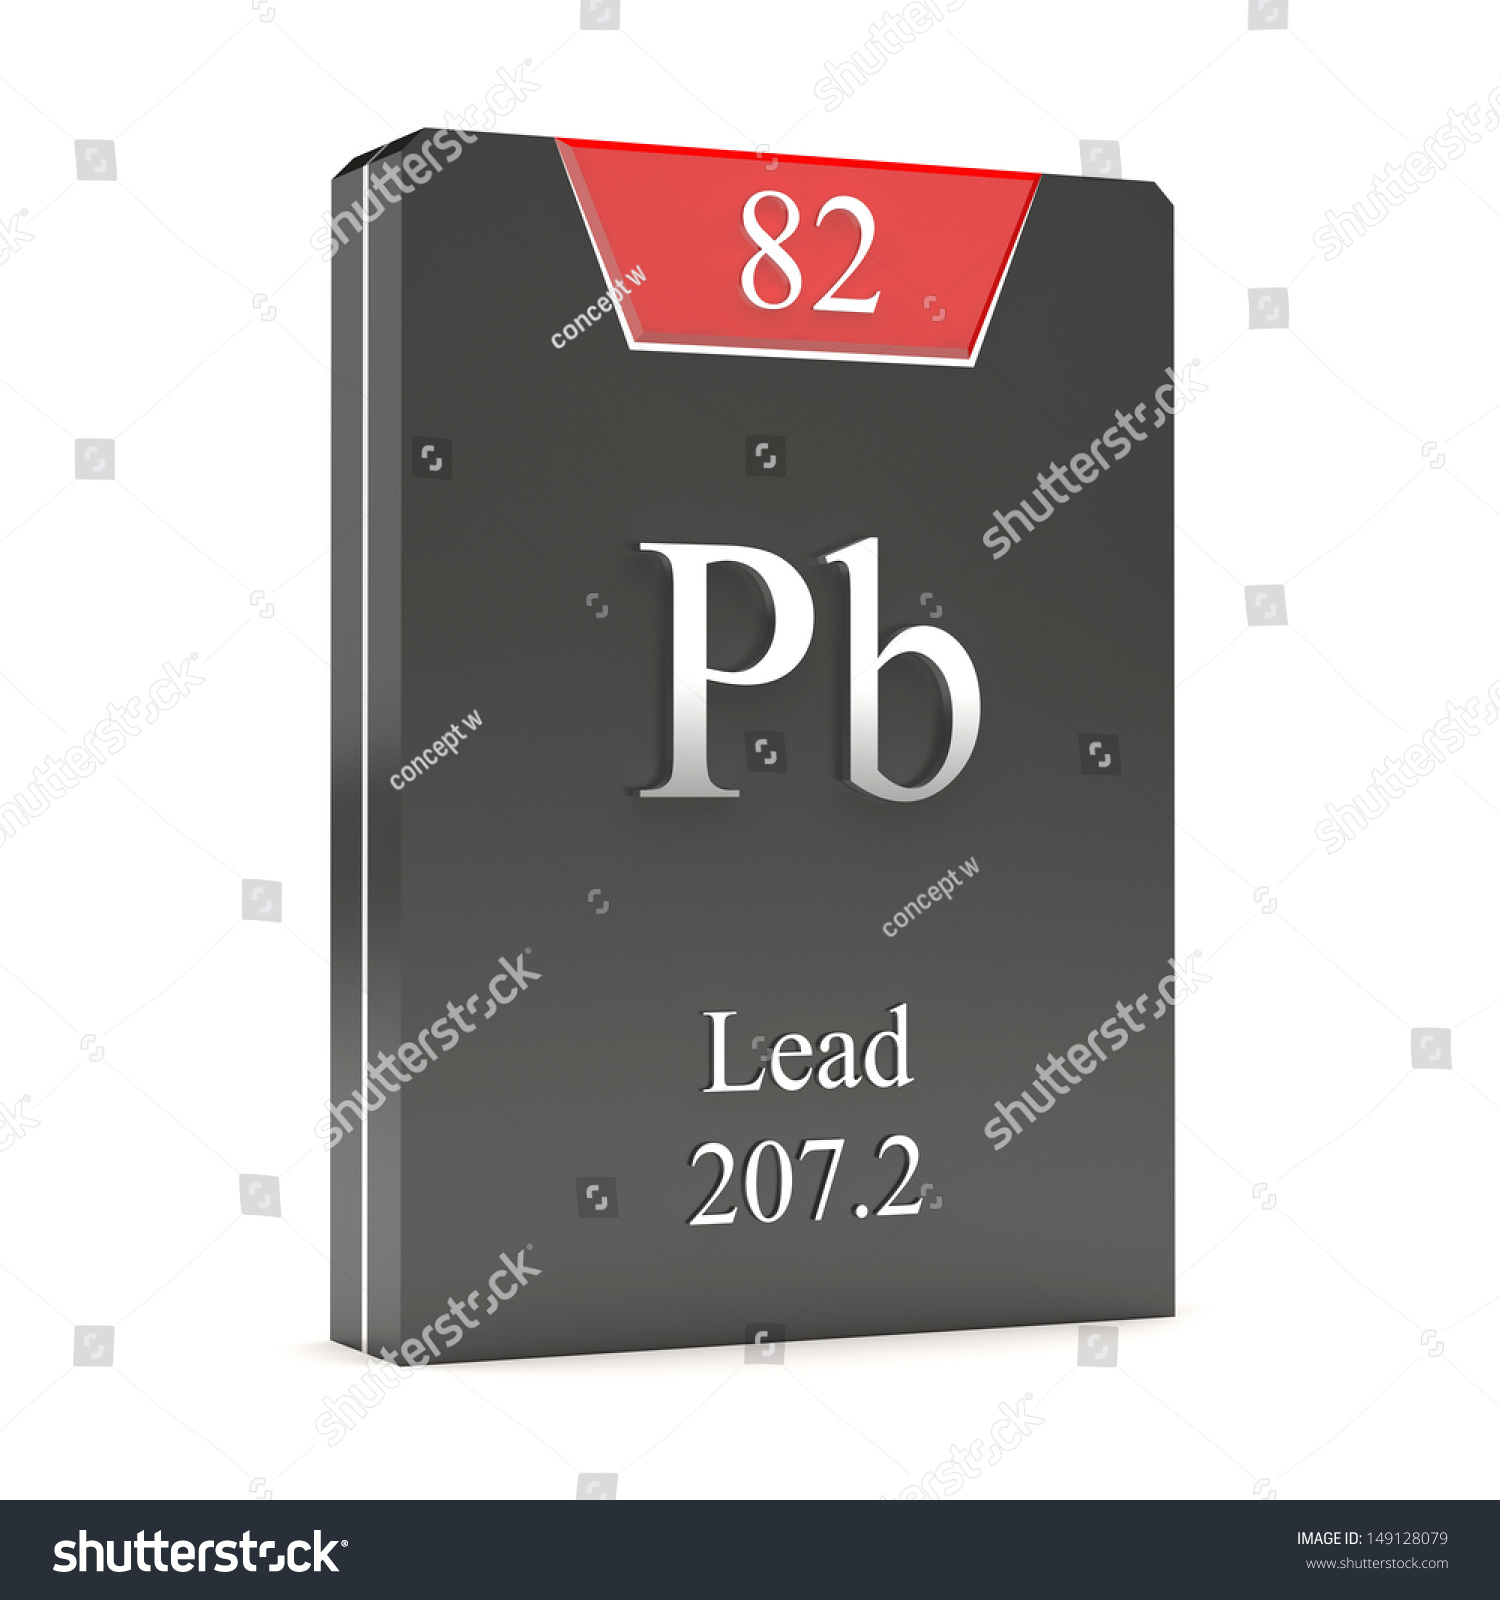 Lead Pb 82 Periodic Table Stock Illustration 149128079 Shutterstock